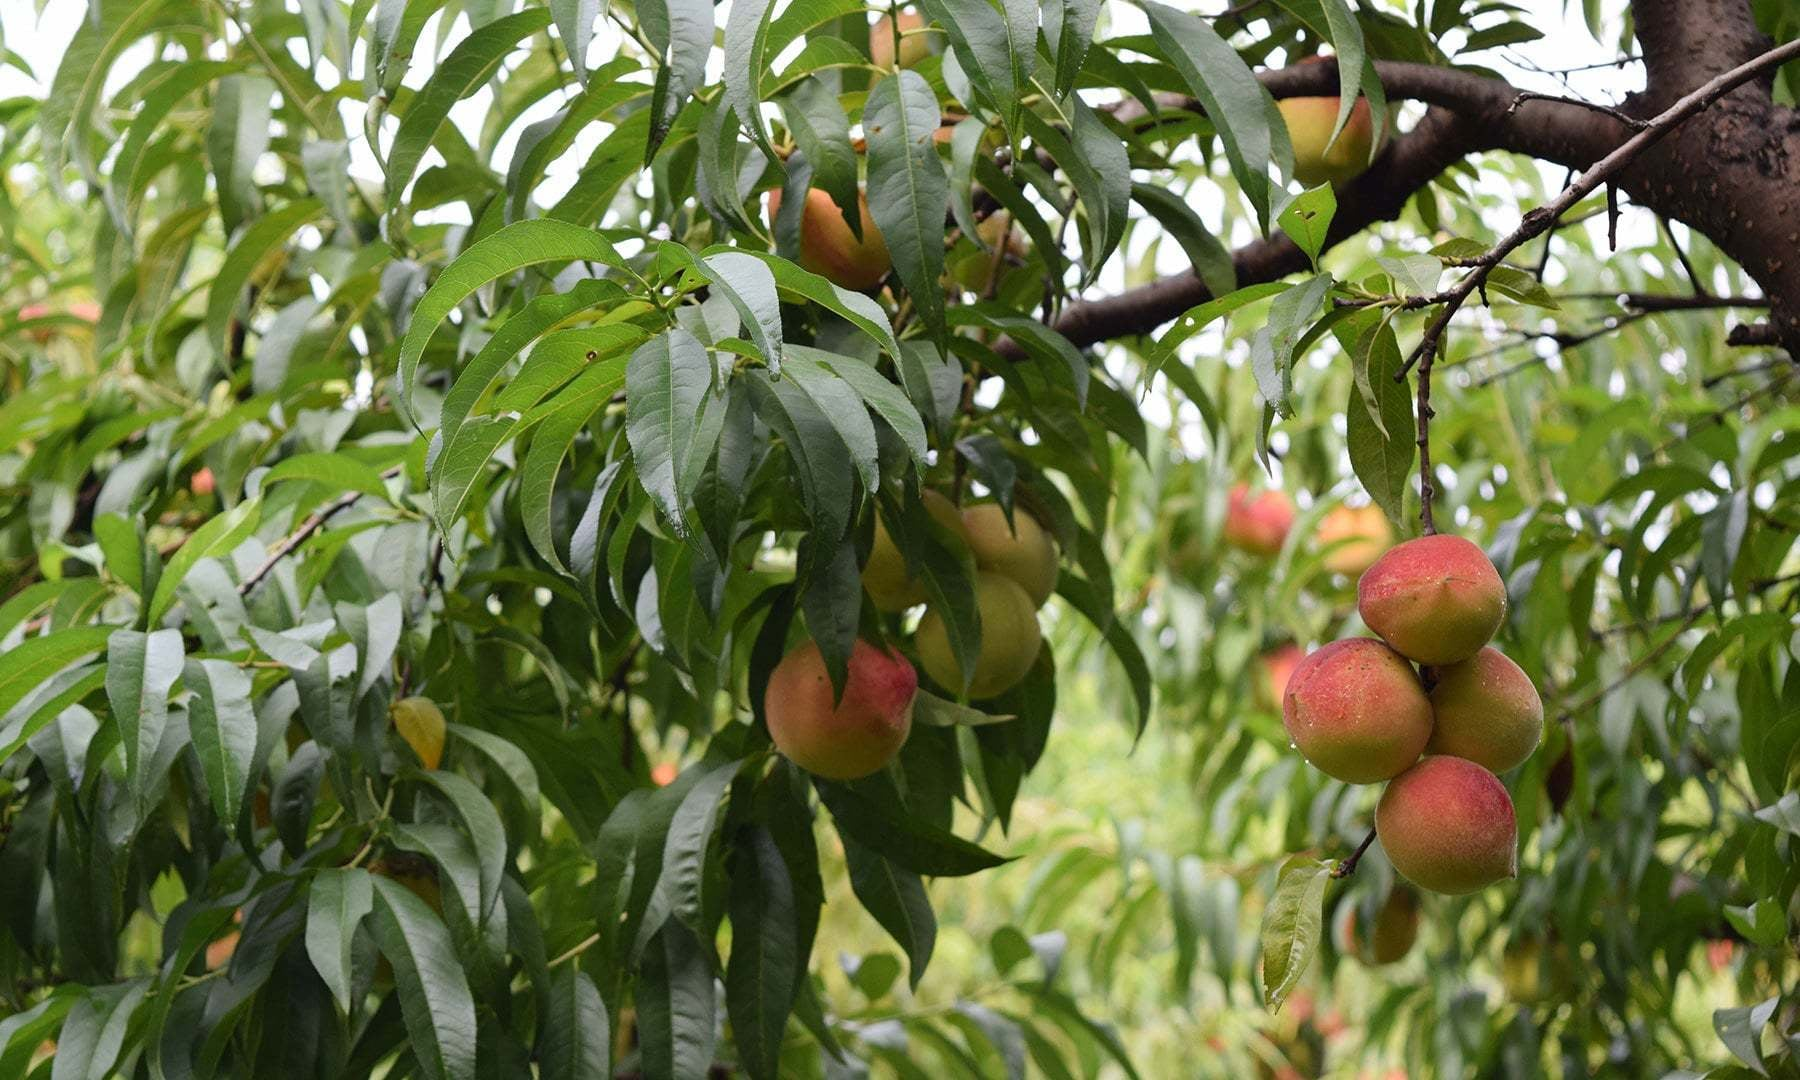 A 'large peach' tree.